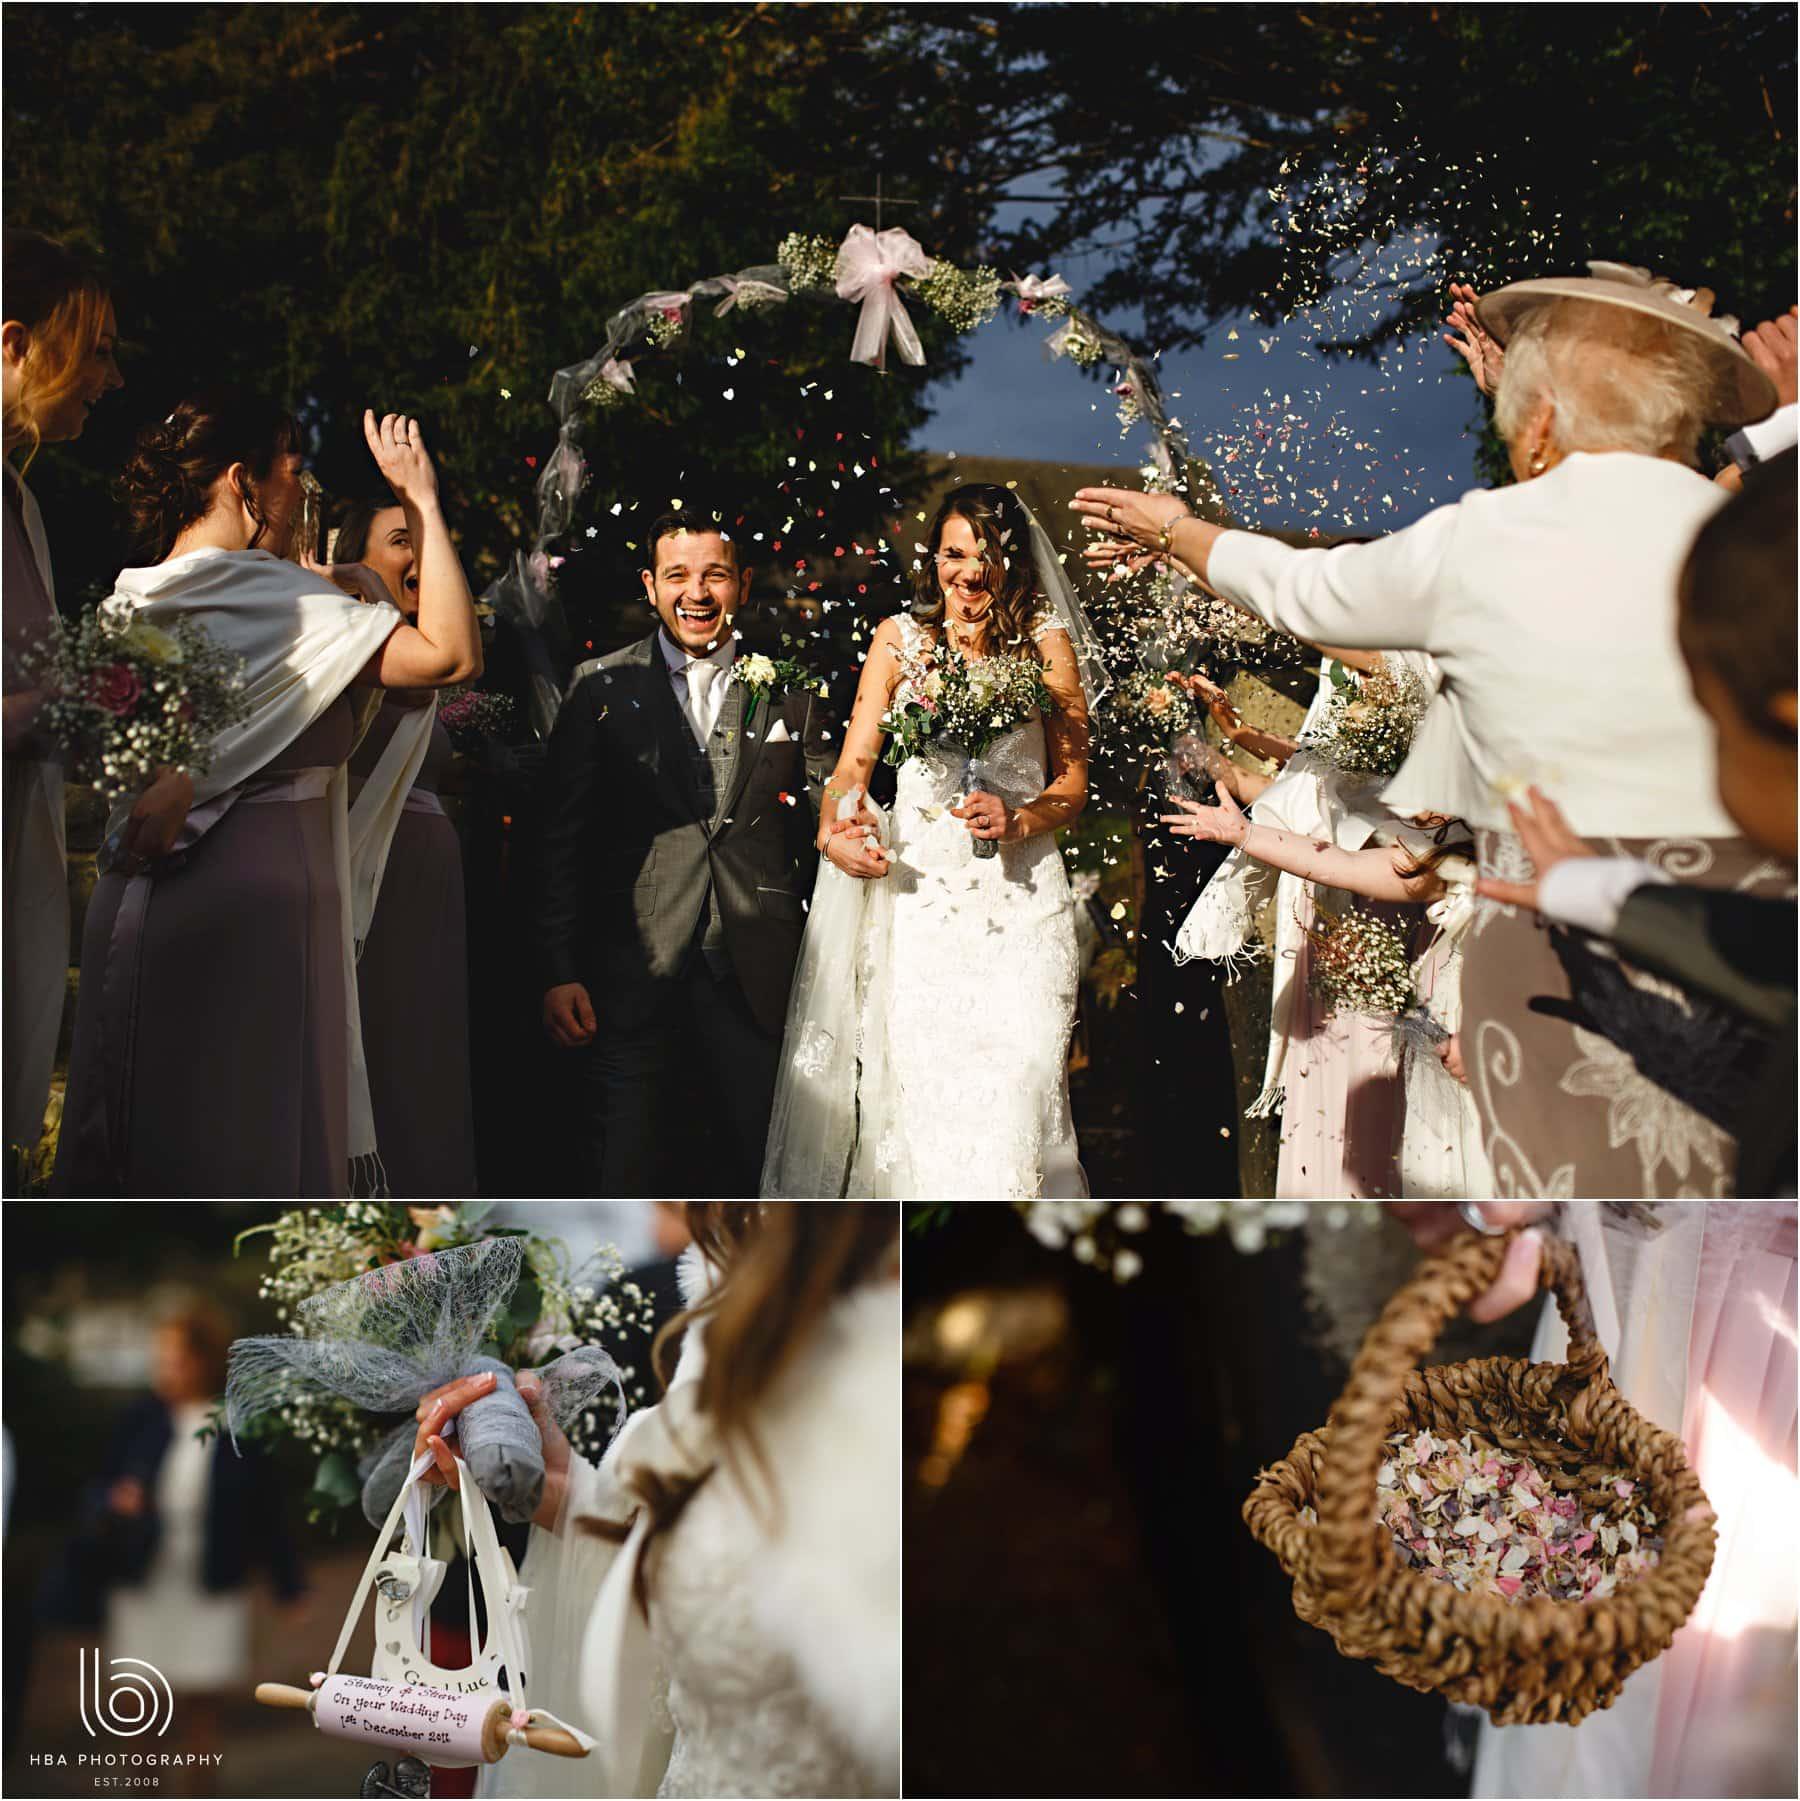 the bride & groom getting covered in confetti